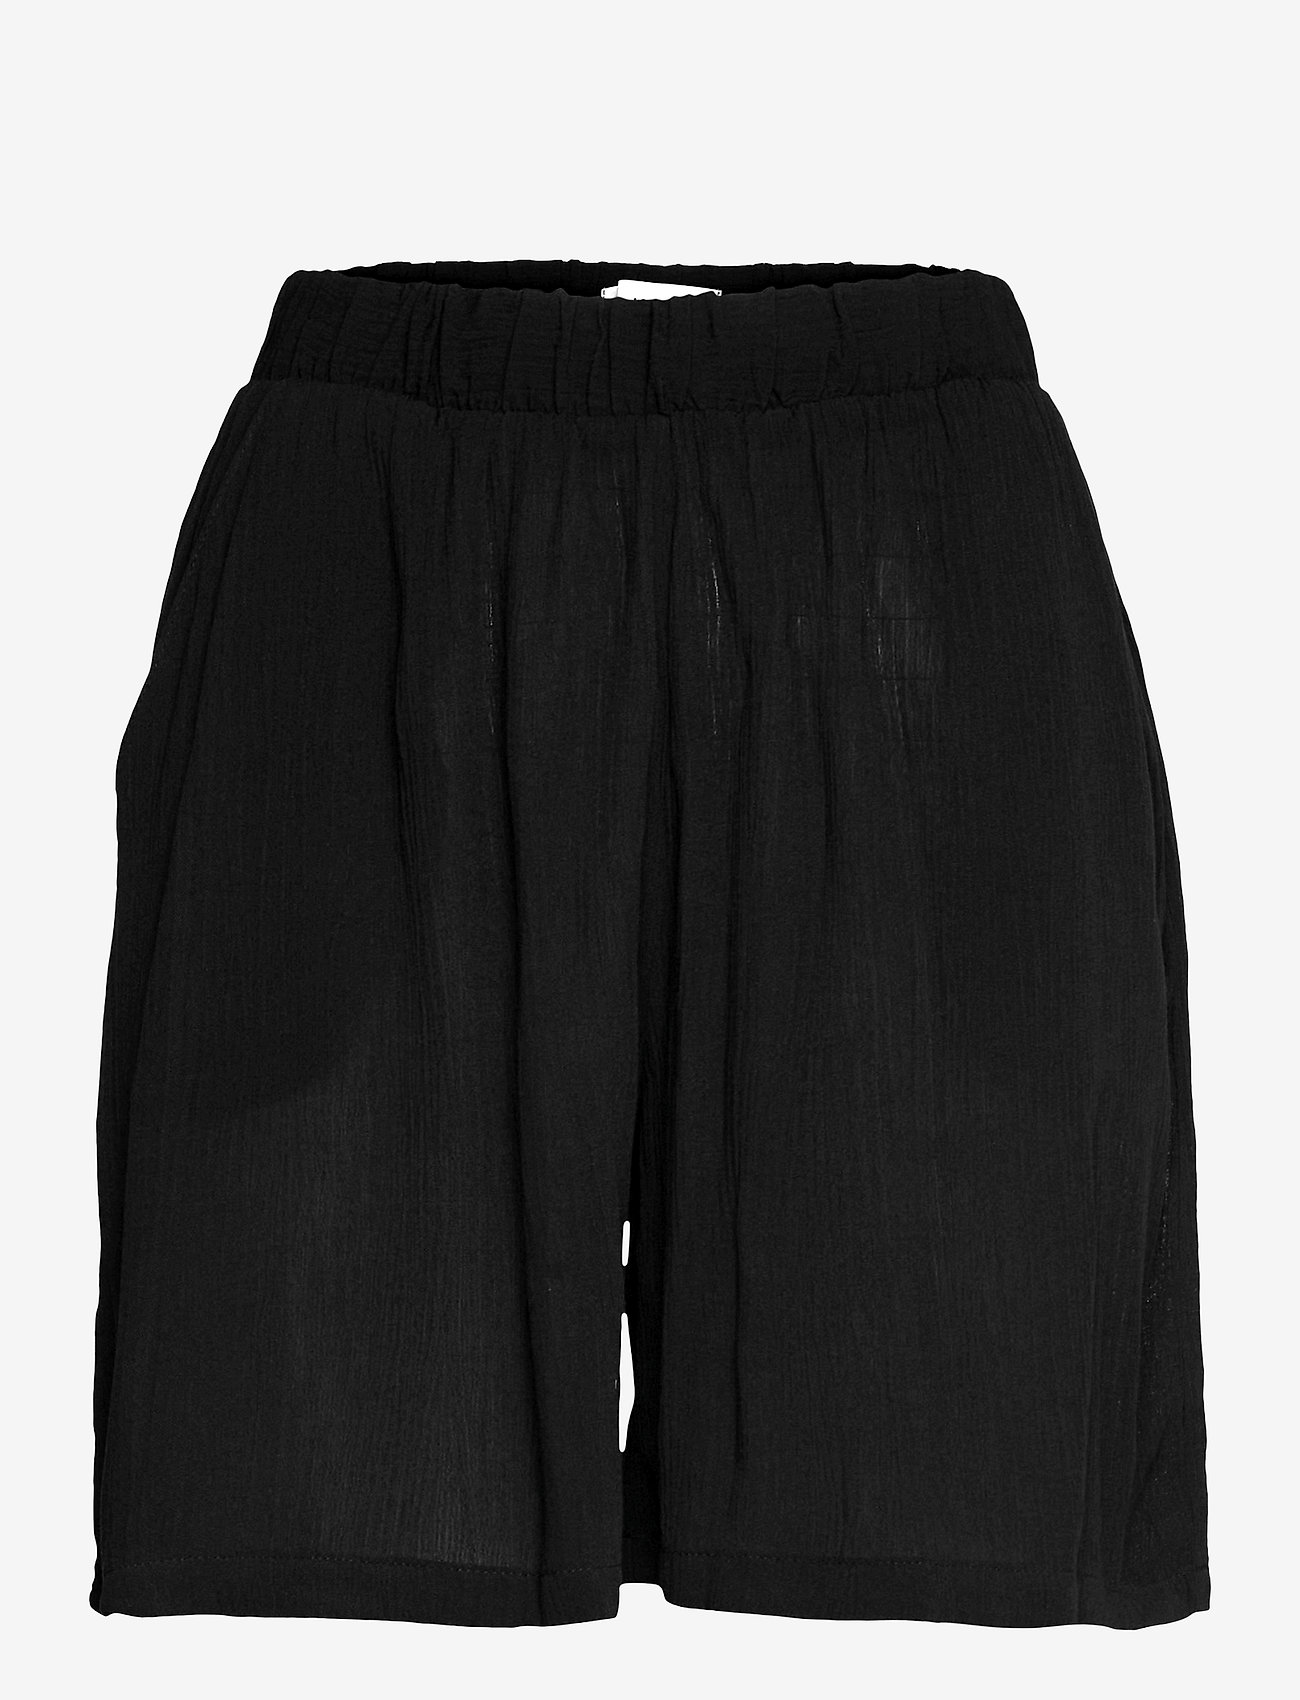 ICHI - IHMARRAKECH SO SHO3 - casual shorts - black - 0